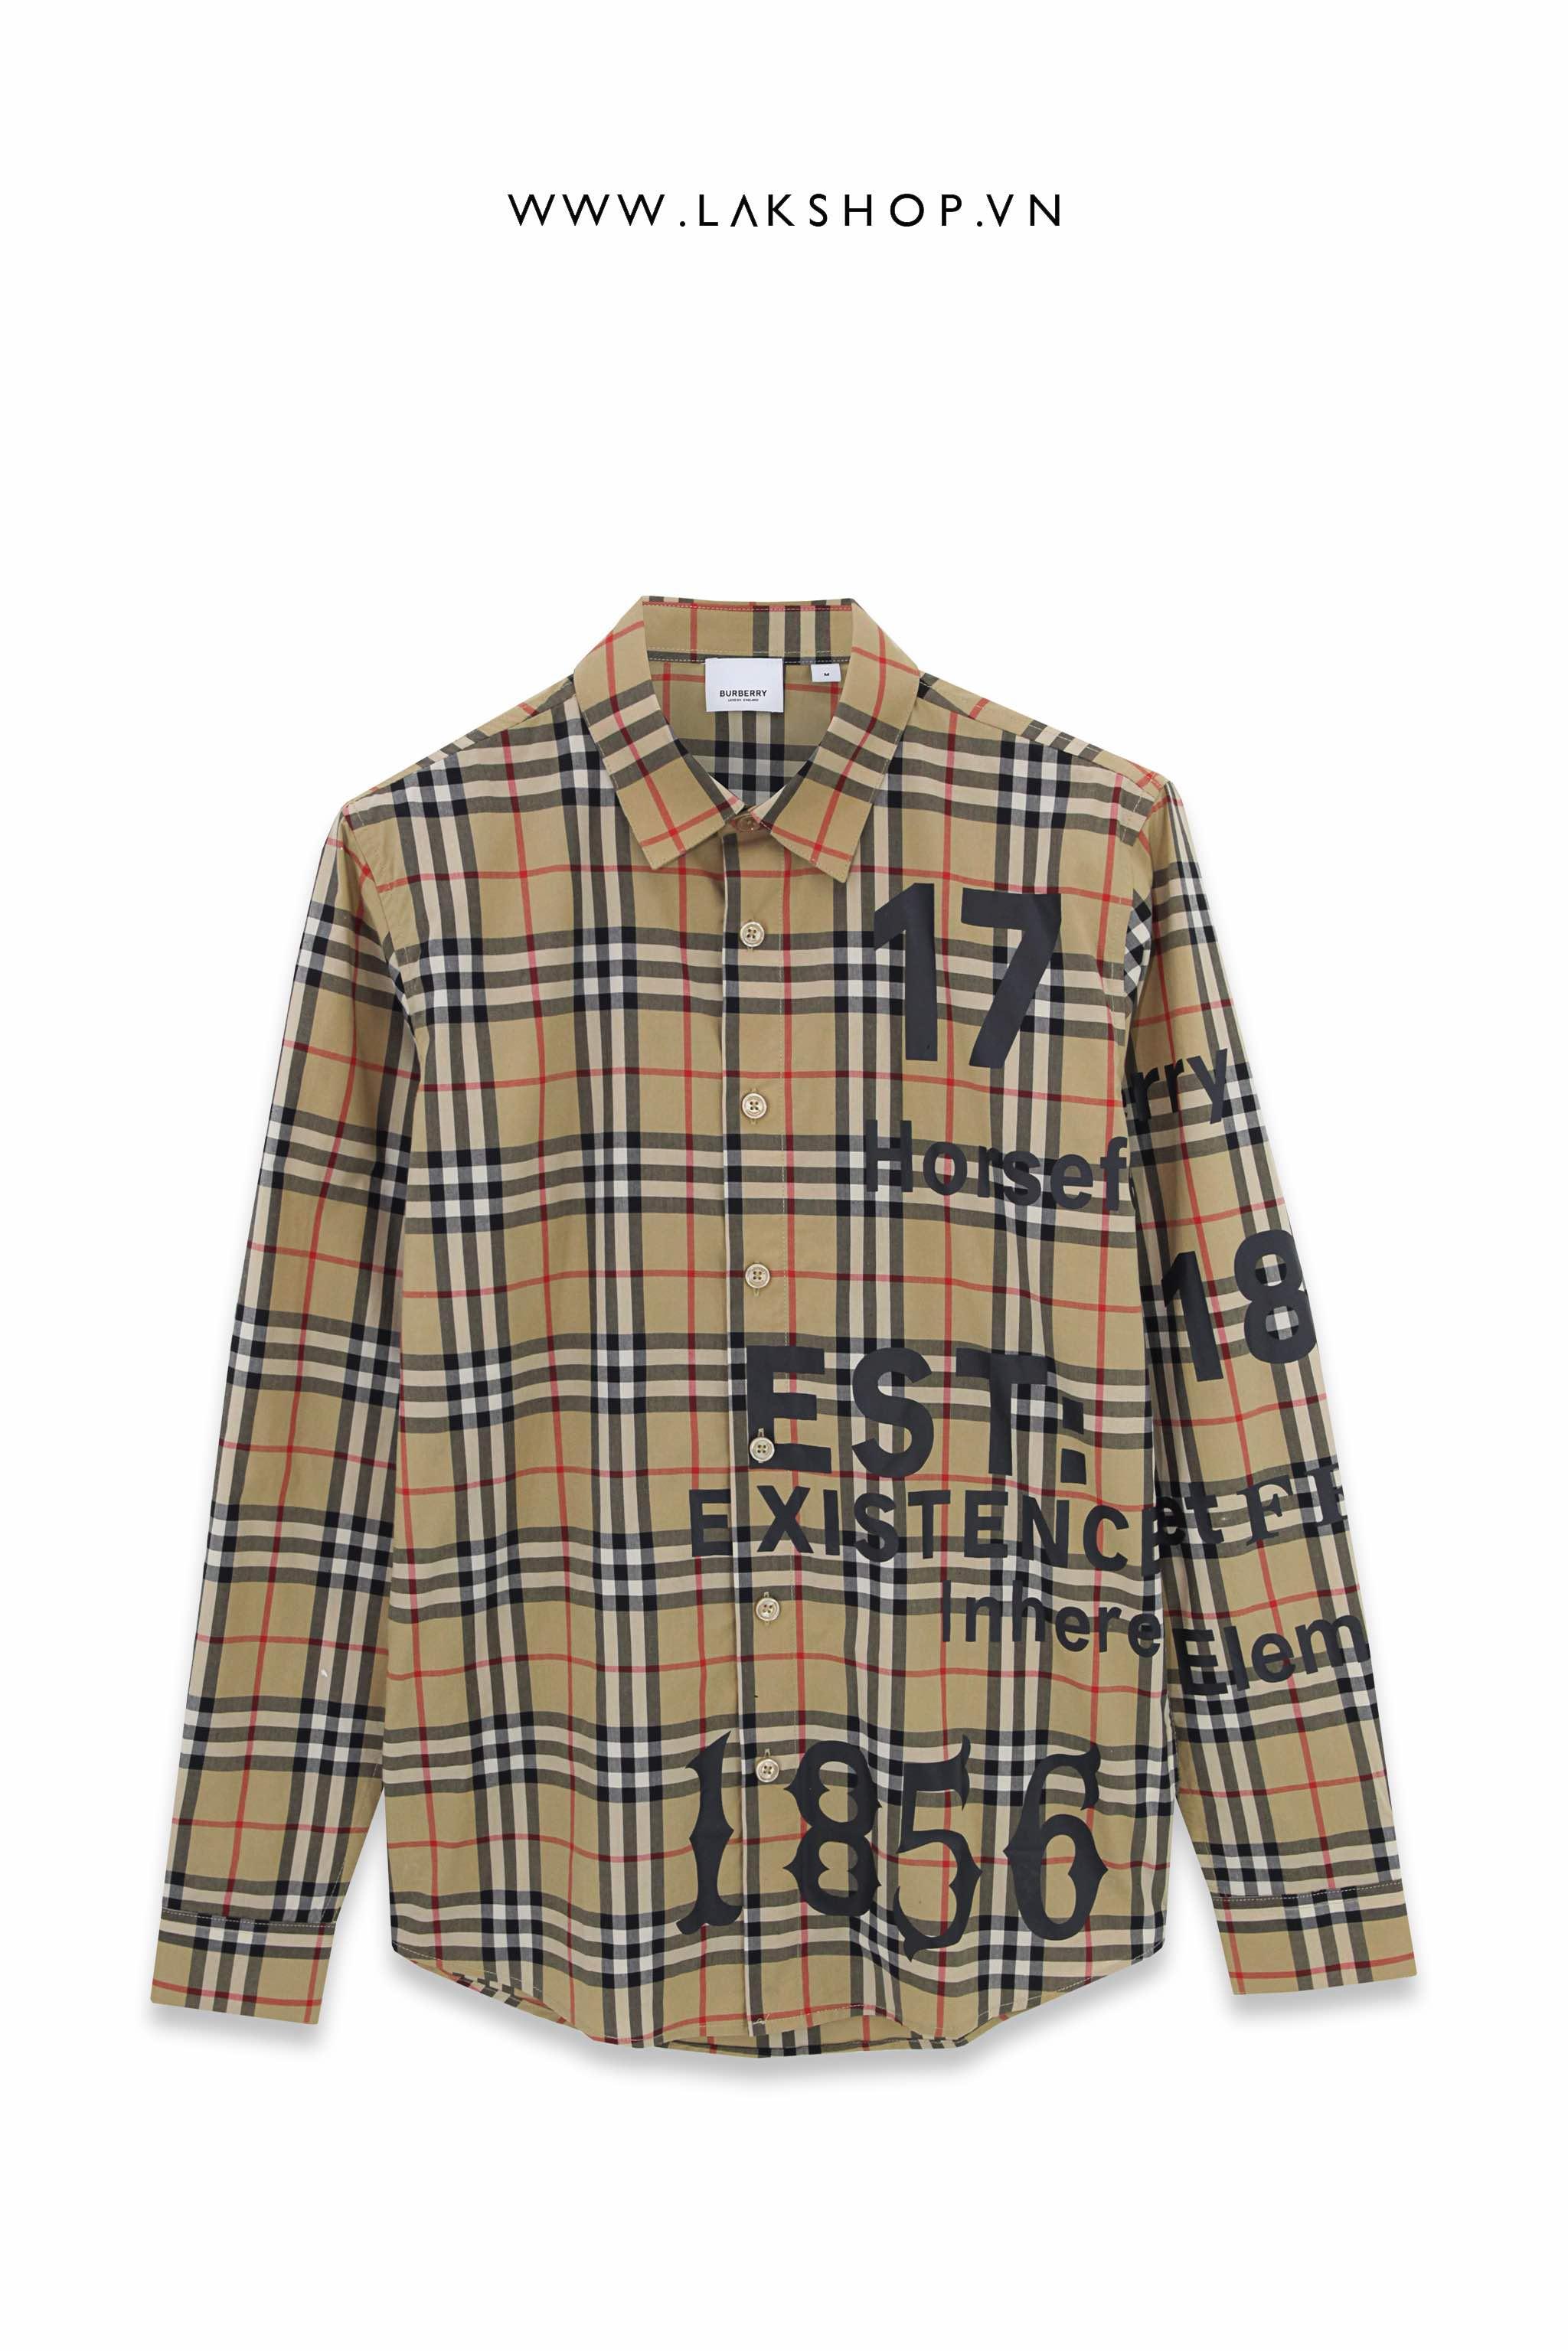 Lak Studios Grey Tweed Check Short Sleeve Shirt